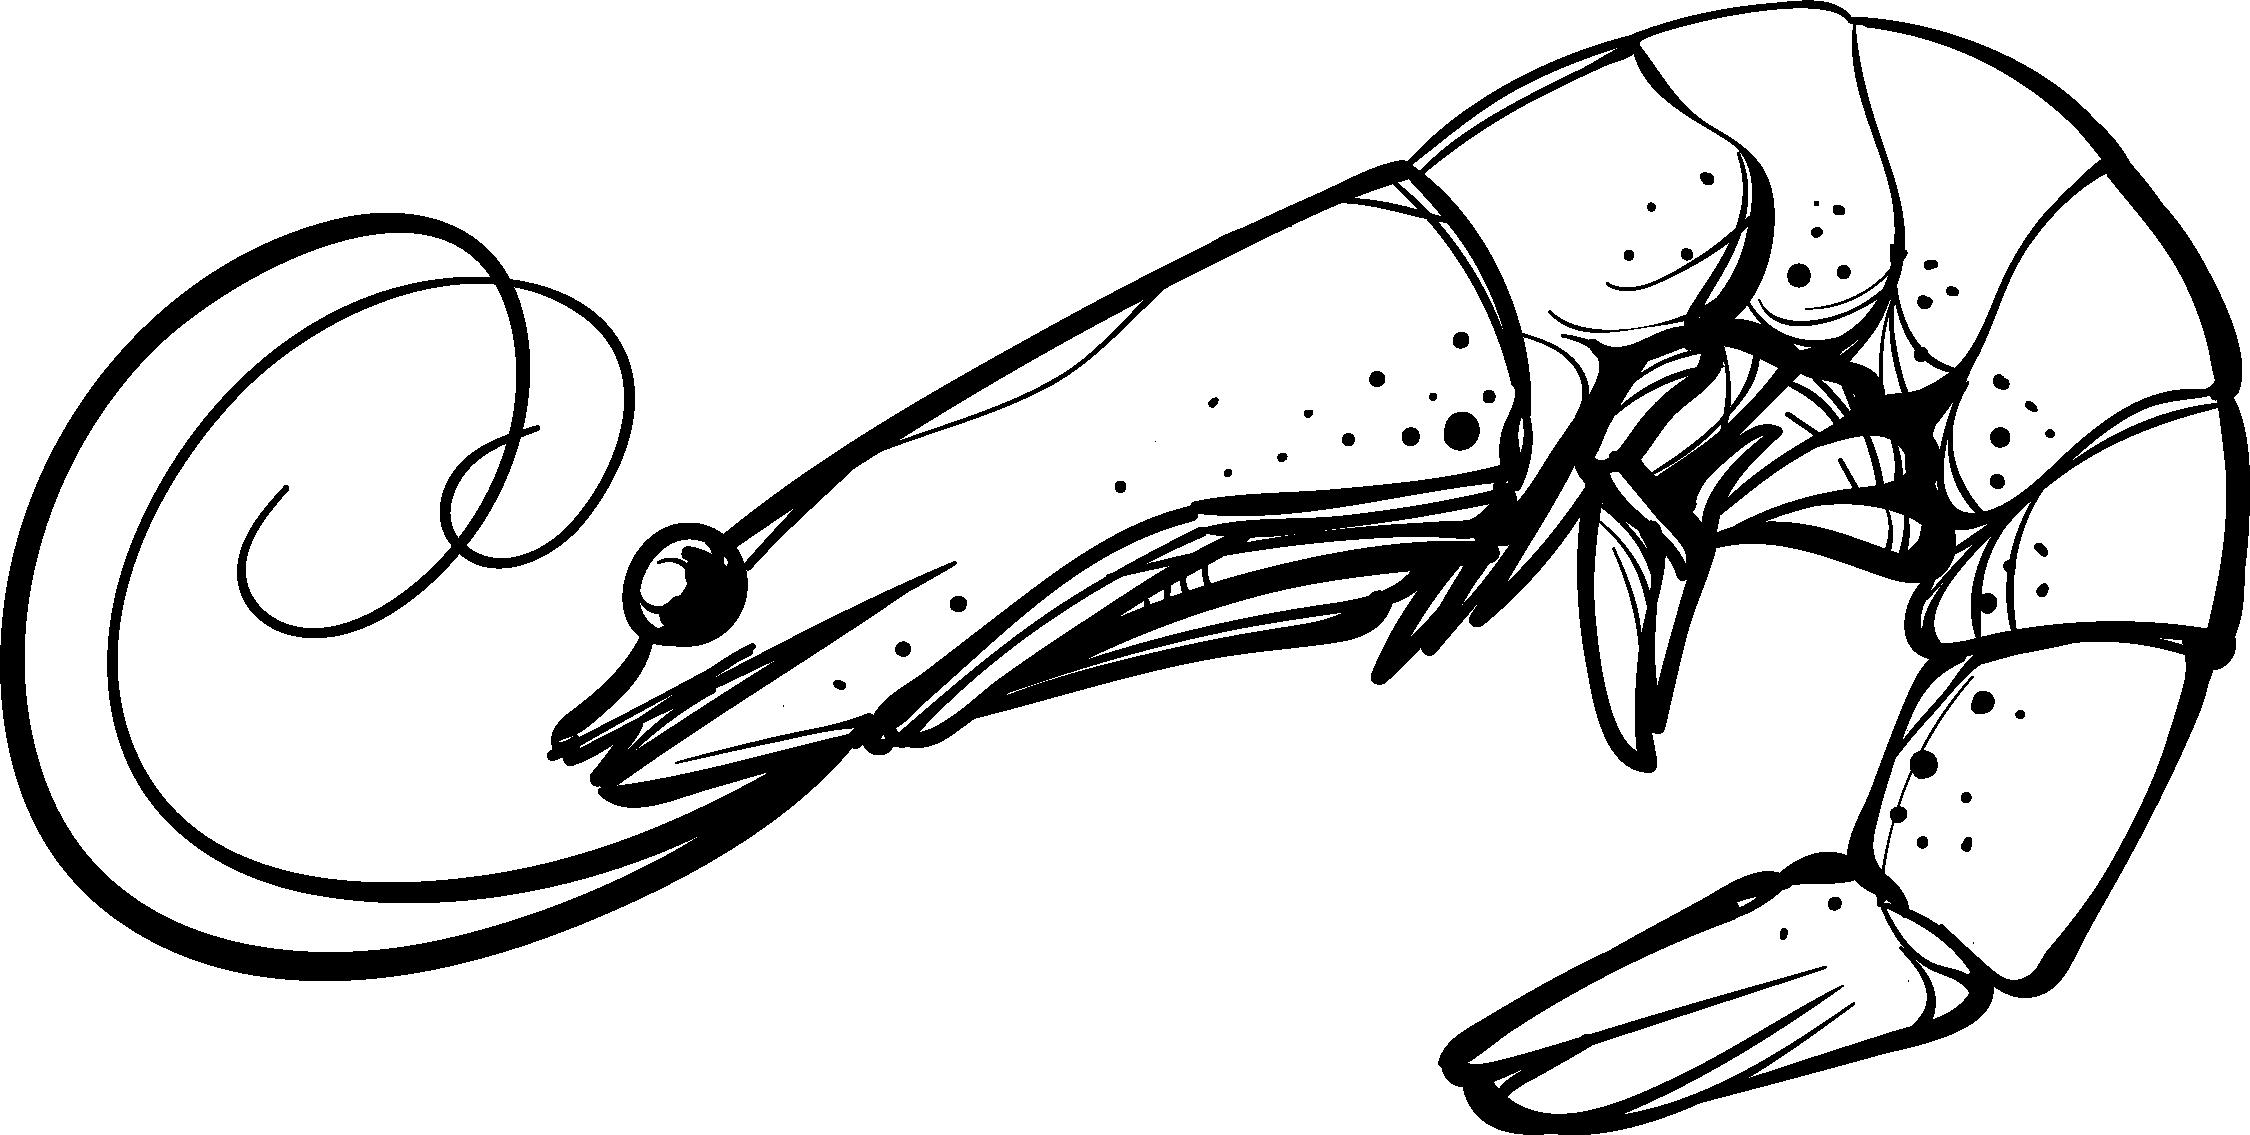 Pomegranate clipart black and white. Shrimp cartoon clip art